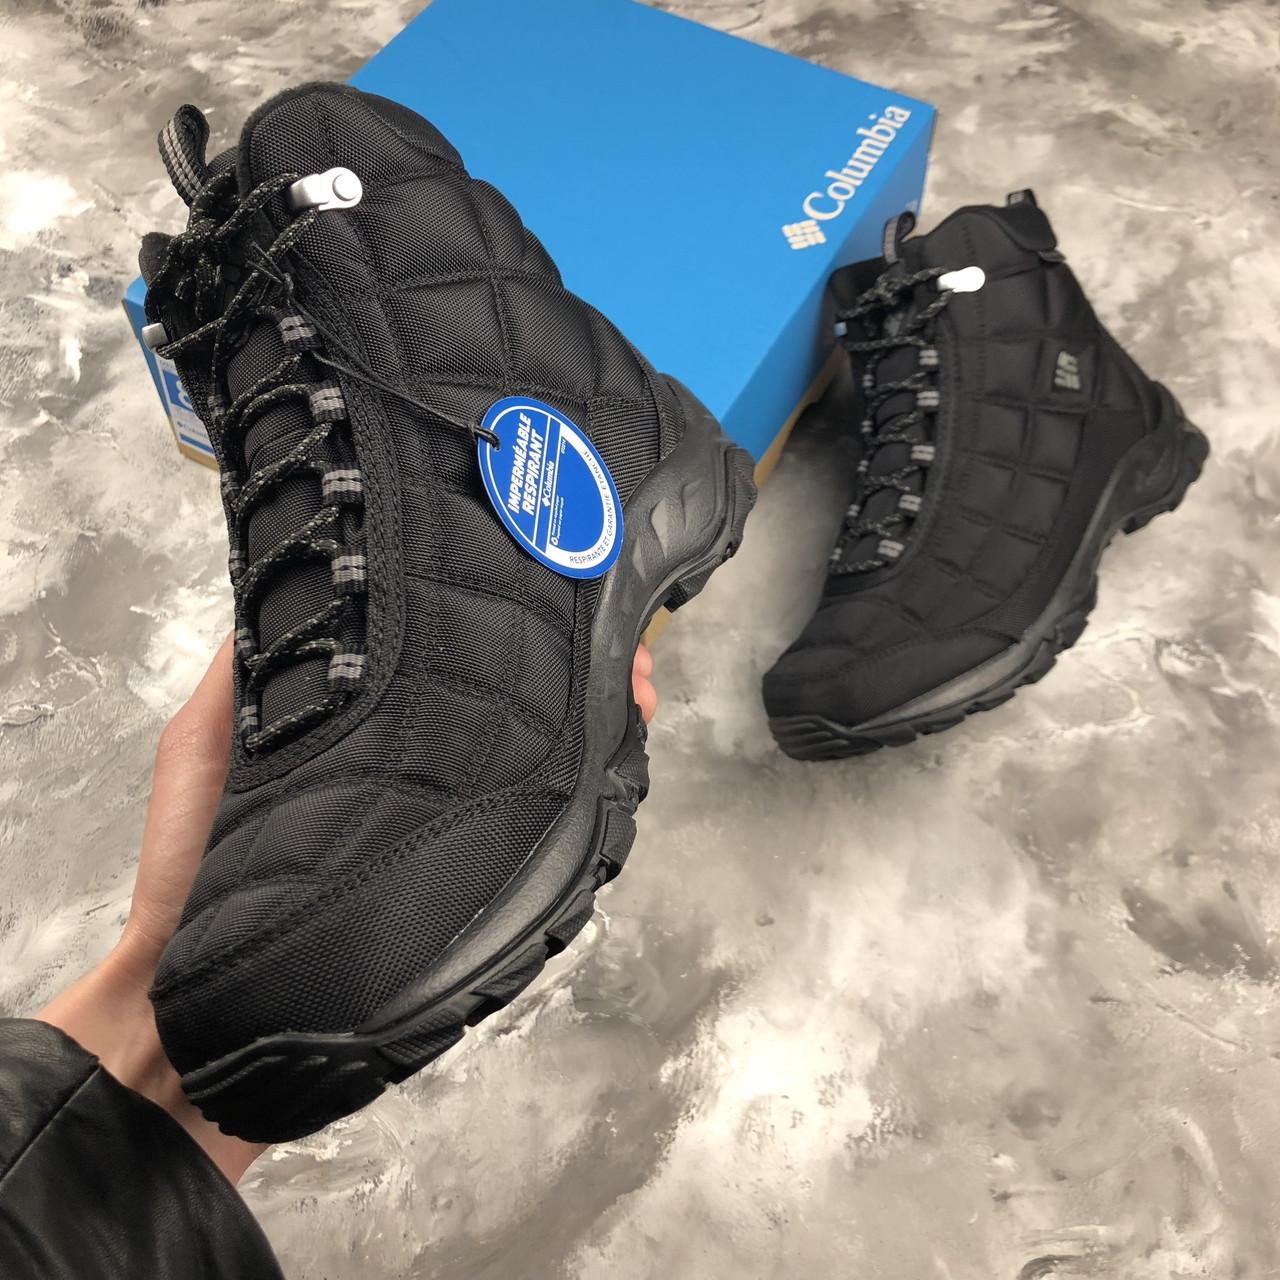 90e6e0533cb Оригинальные зимние кроссовки Columbia Firecamp Boot Black, 1672881 - 012